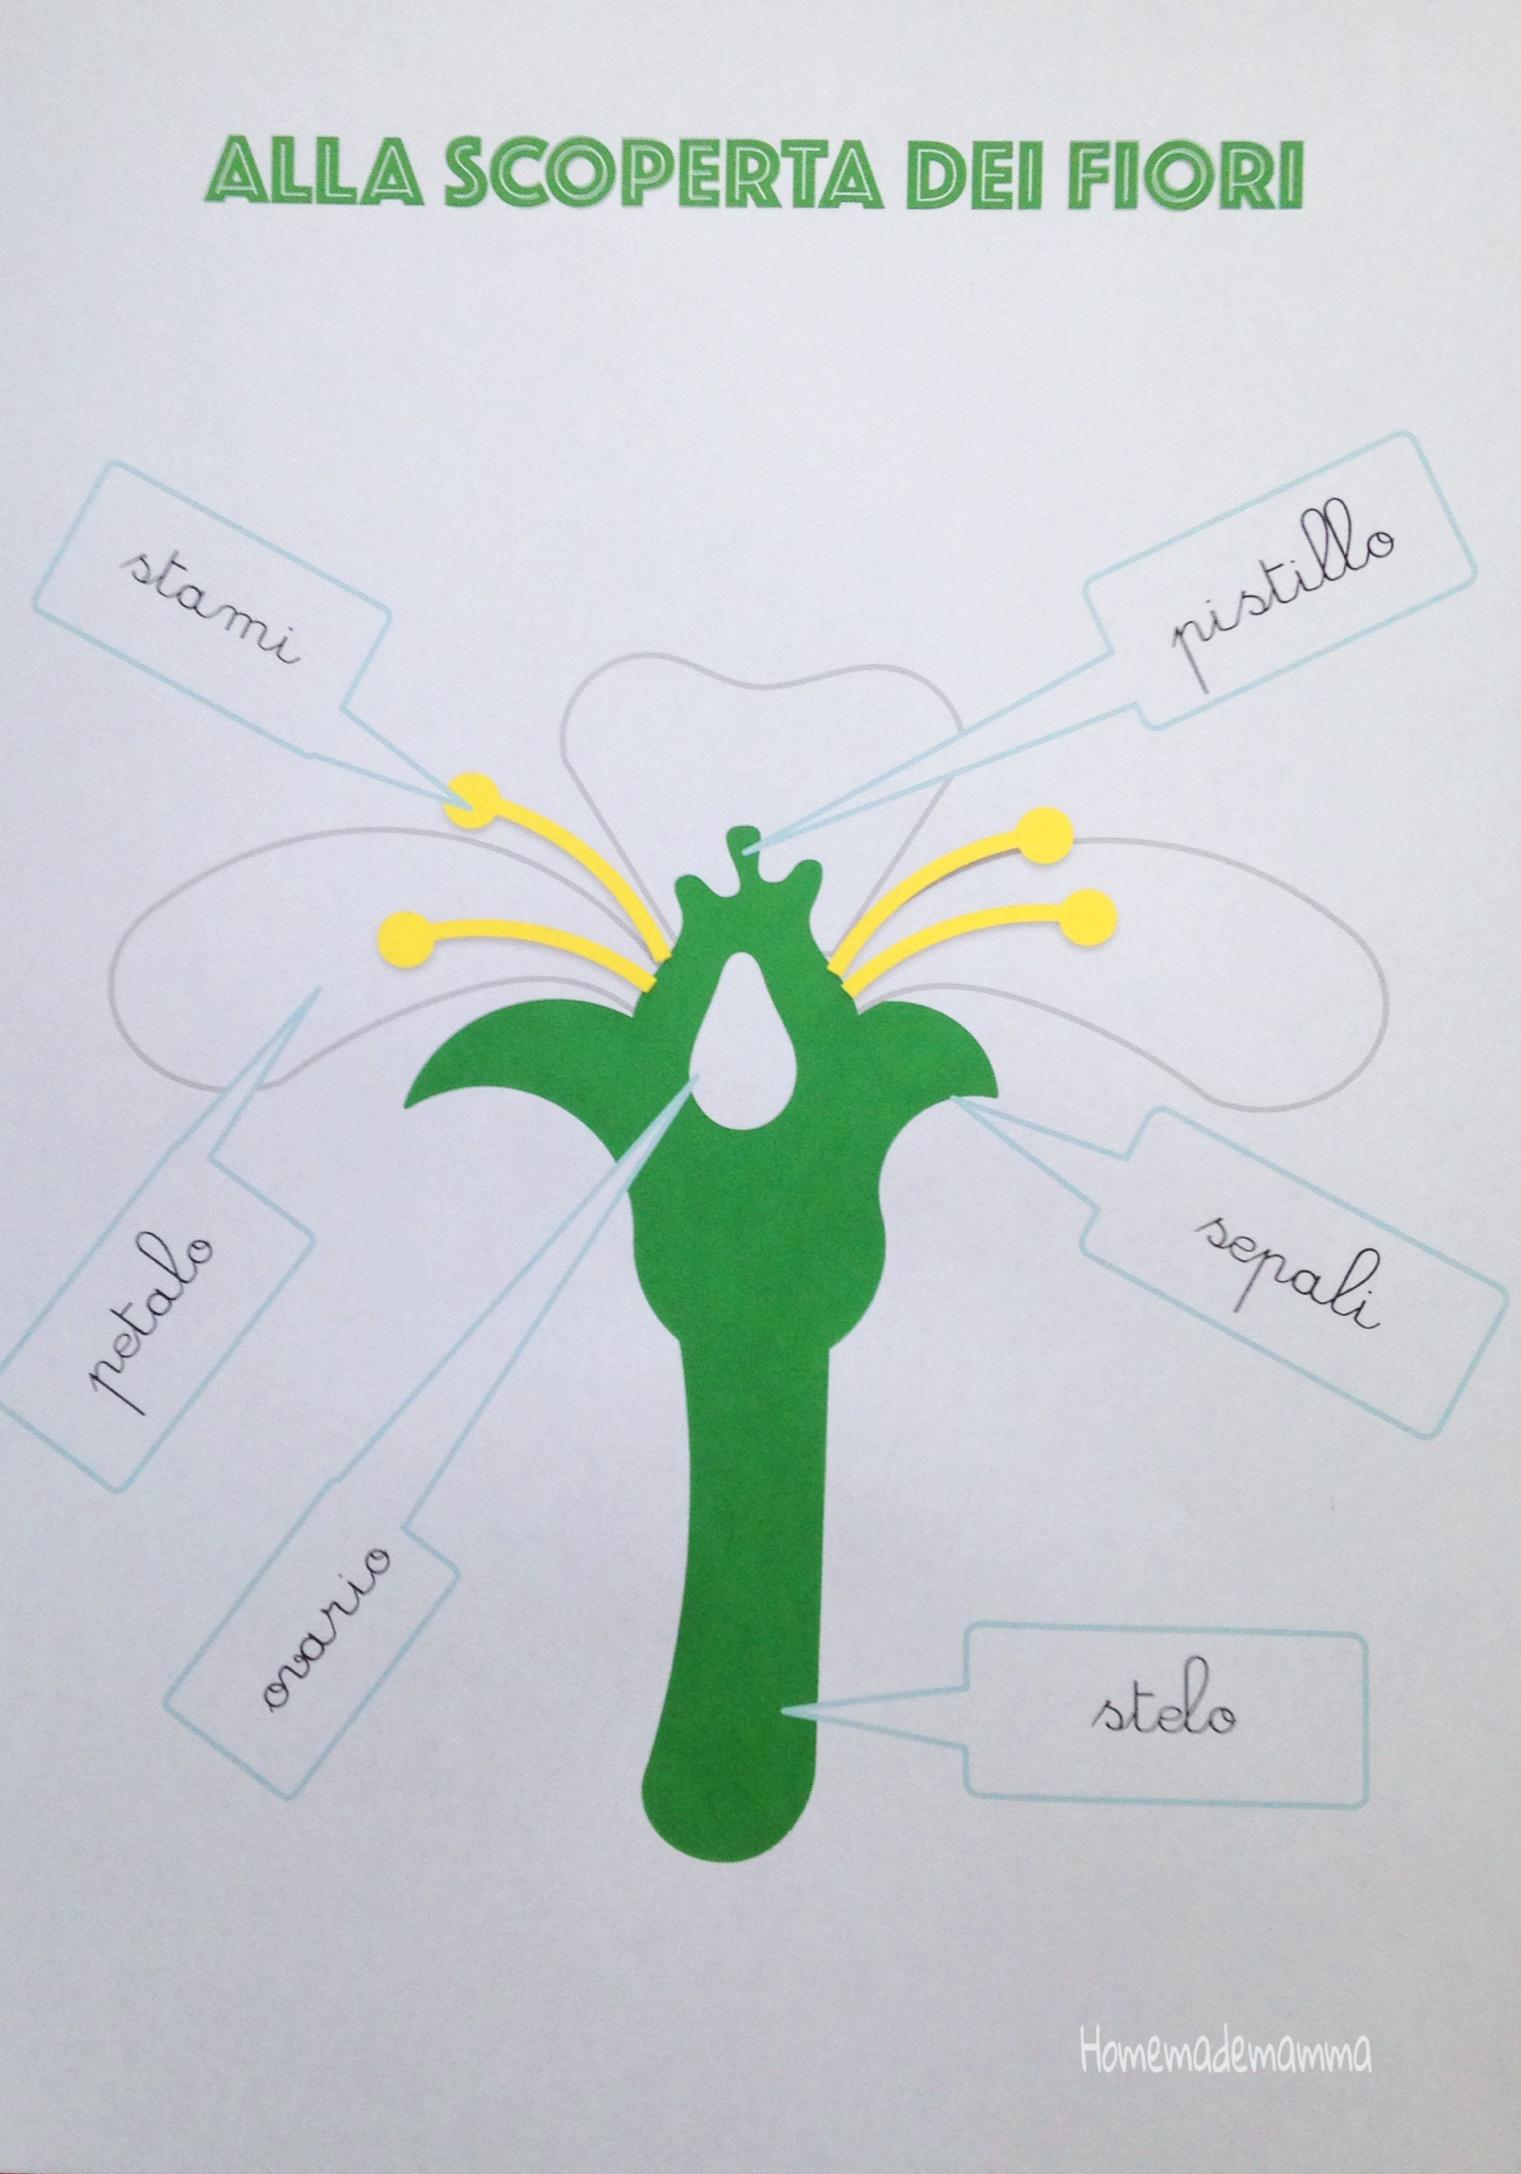 schede botanica montessori gratis